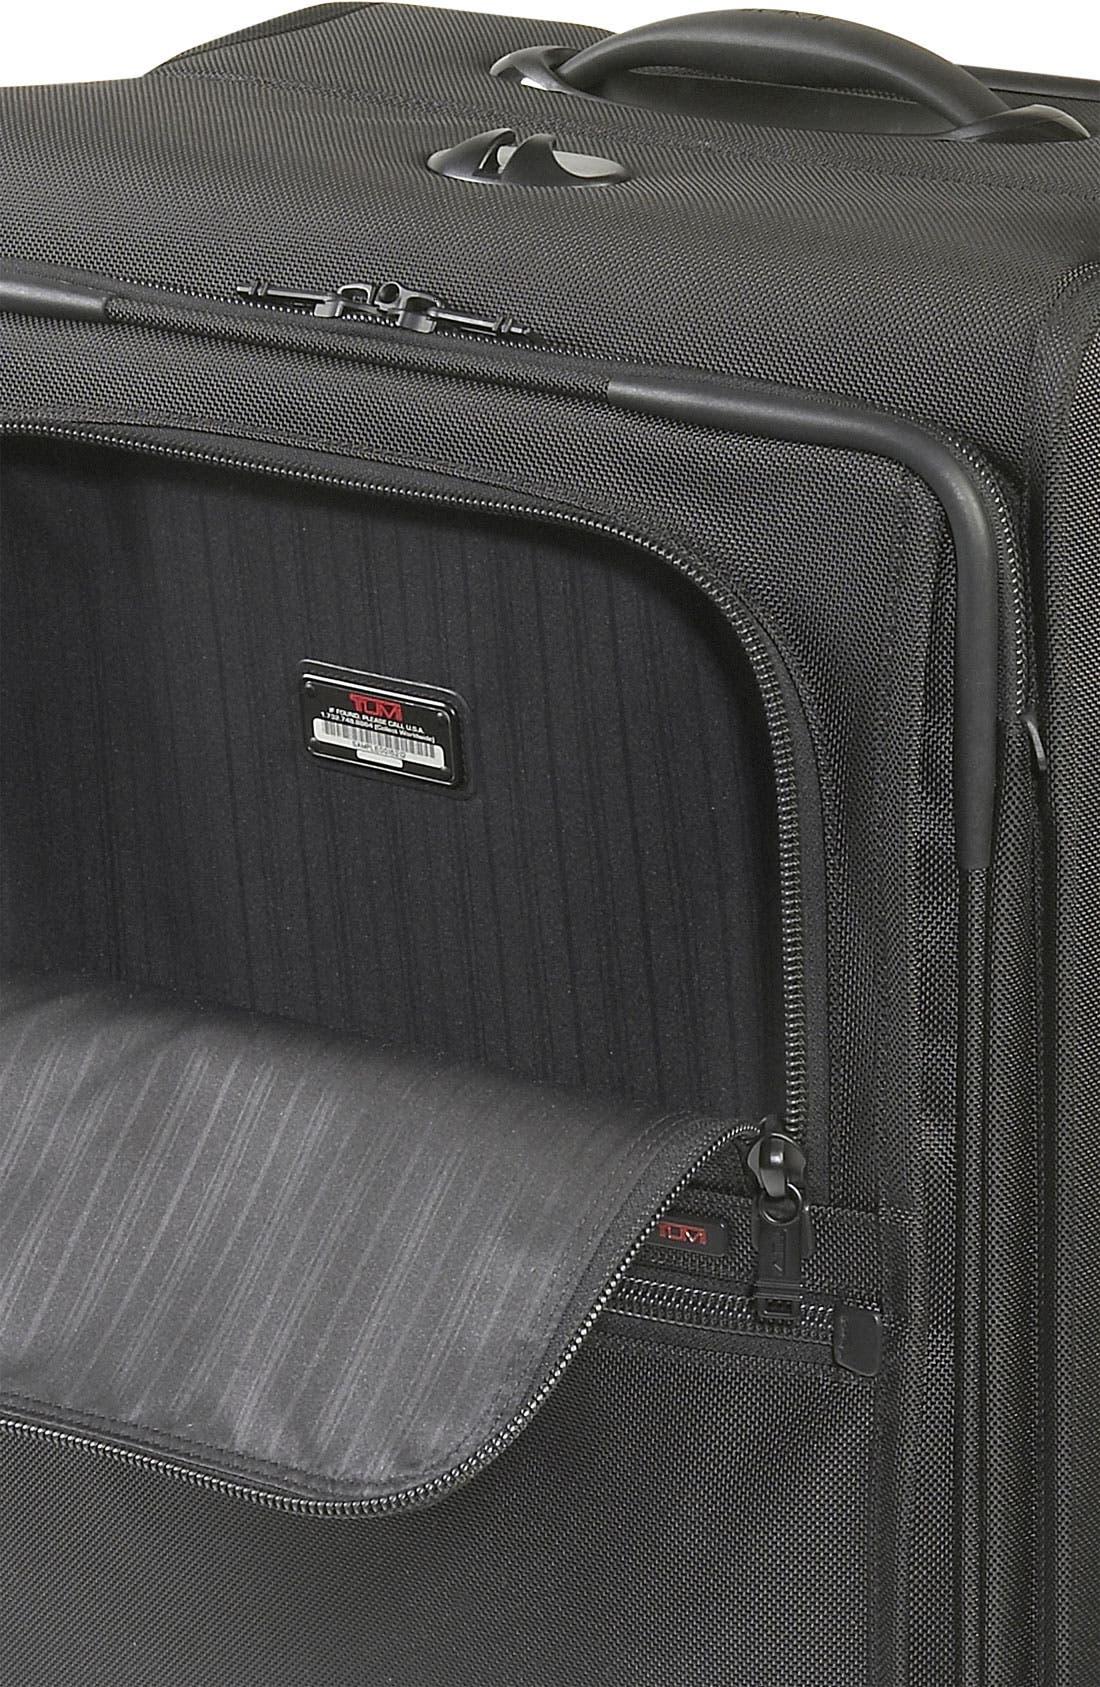 Alternate Image 3  - Tumi 'Alpha' 4-Wheeled Expandable Fortnight Trip Bag